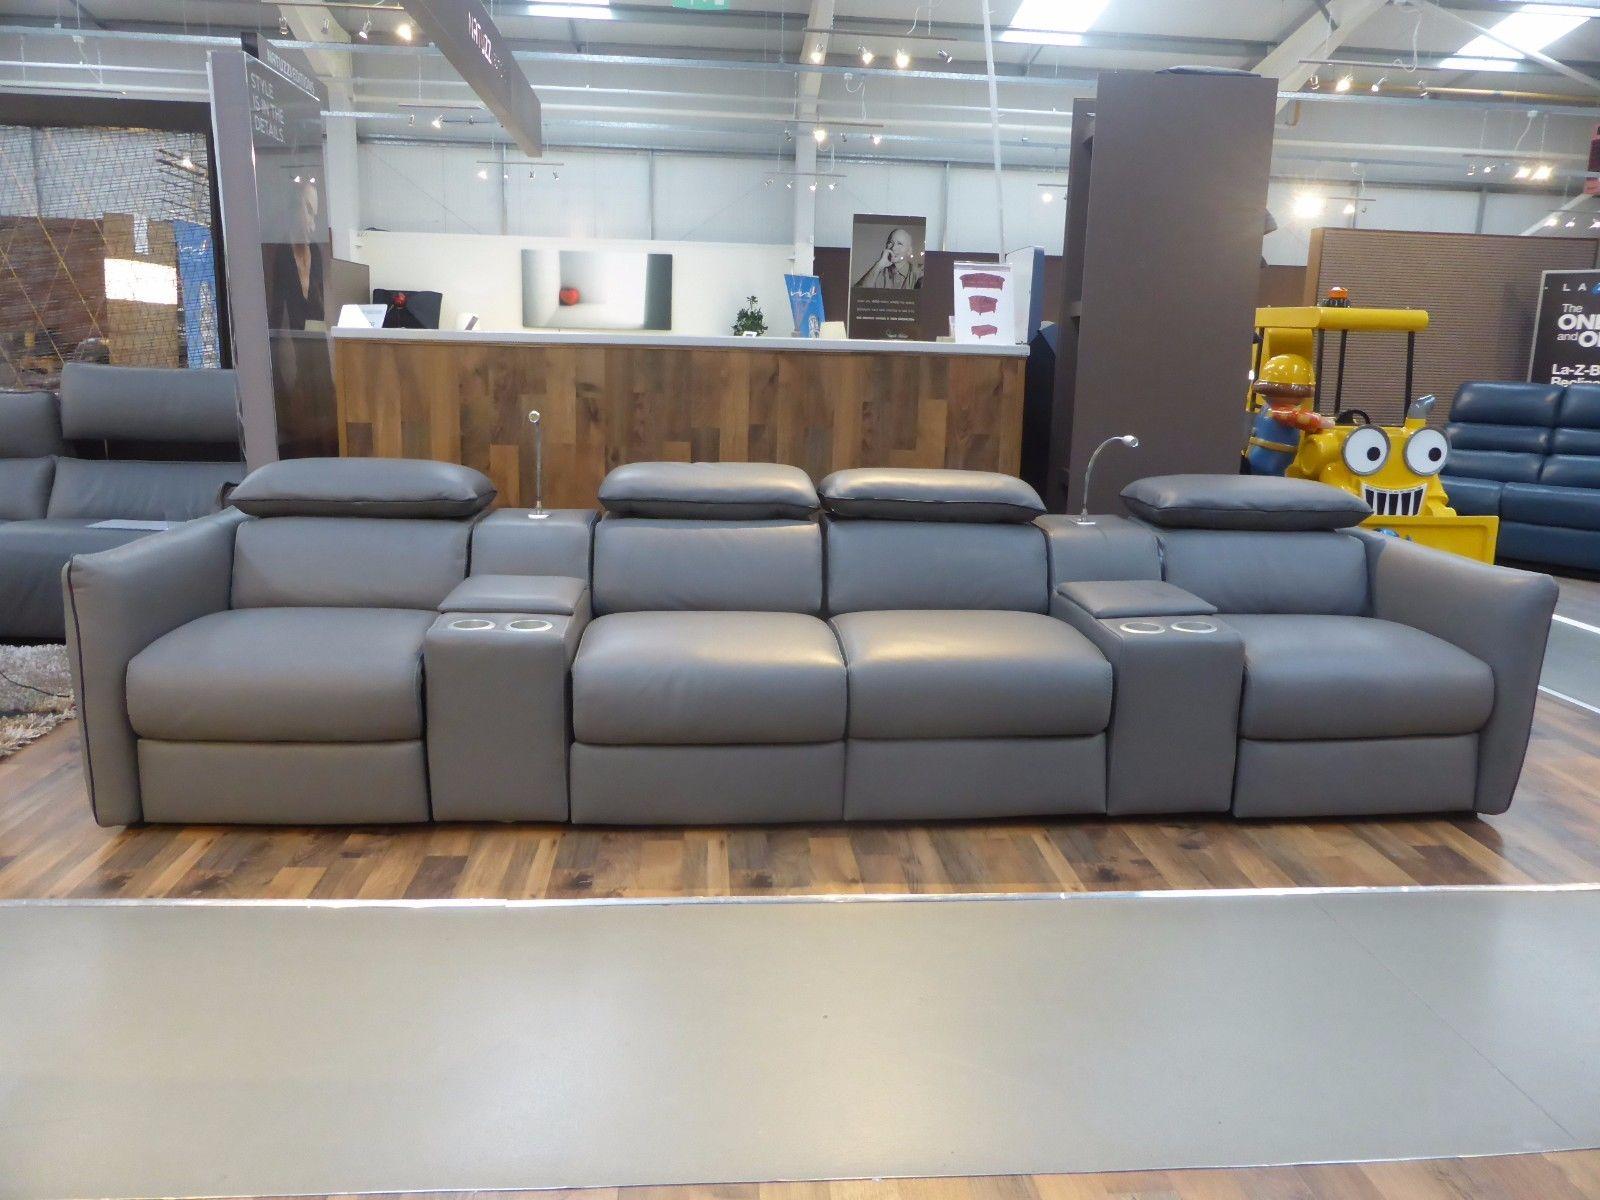 Brand new natuzzi cinema sofa latest model high grade for Sofas natuzzi outlet madrid